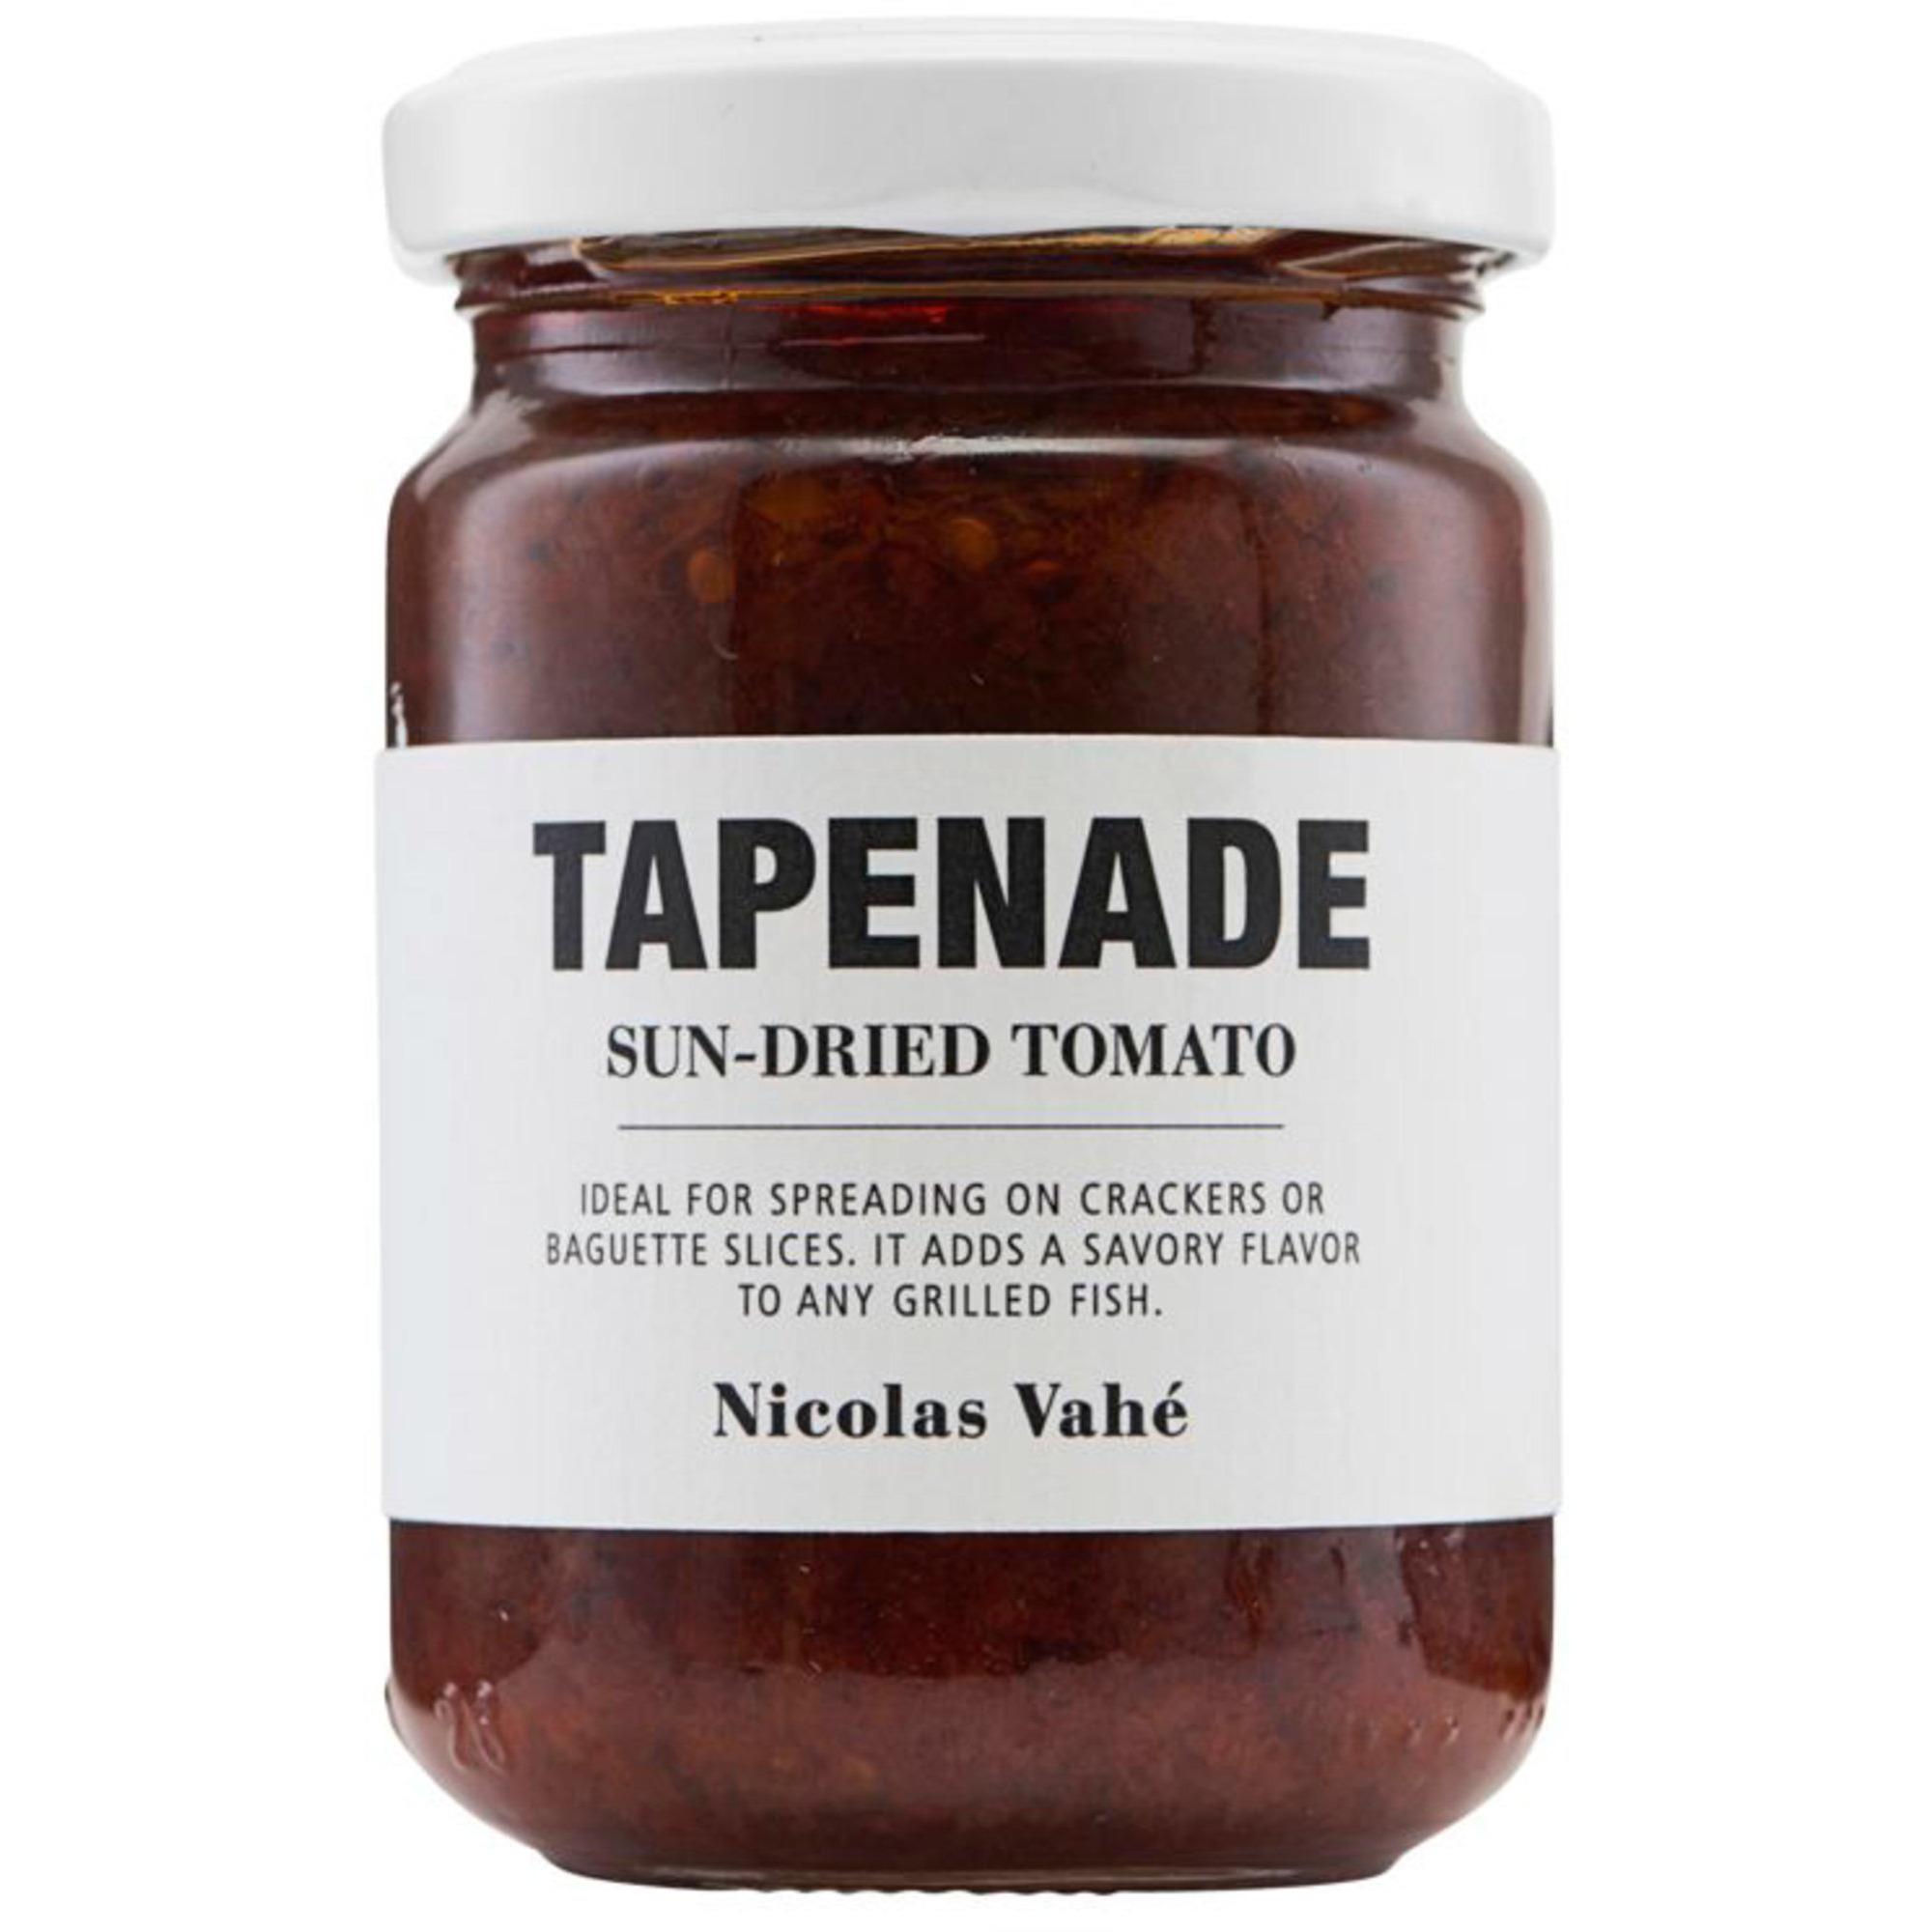 Nicolas Vahé Tapenade m. soltorkade tomater